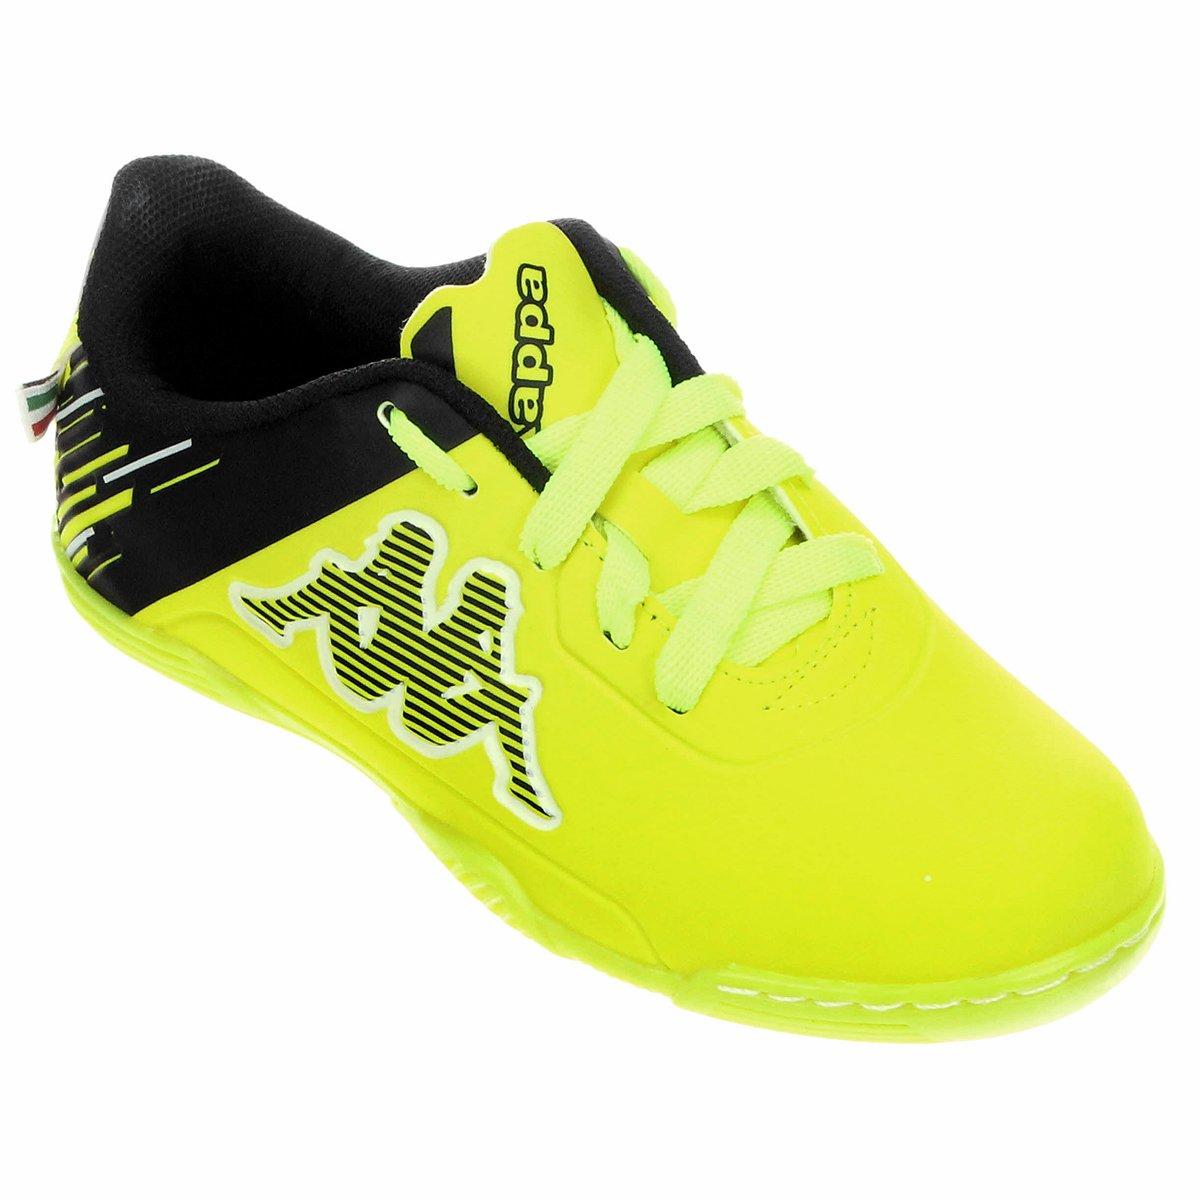 Chuteira Kappa Viento Futsal Infantil - Compre Agora   Netshoes c1936dedf4